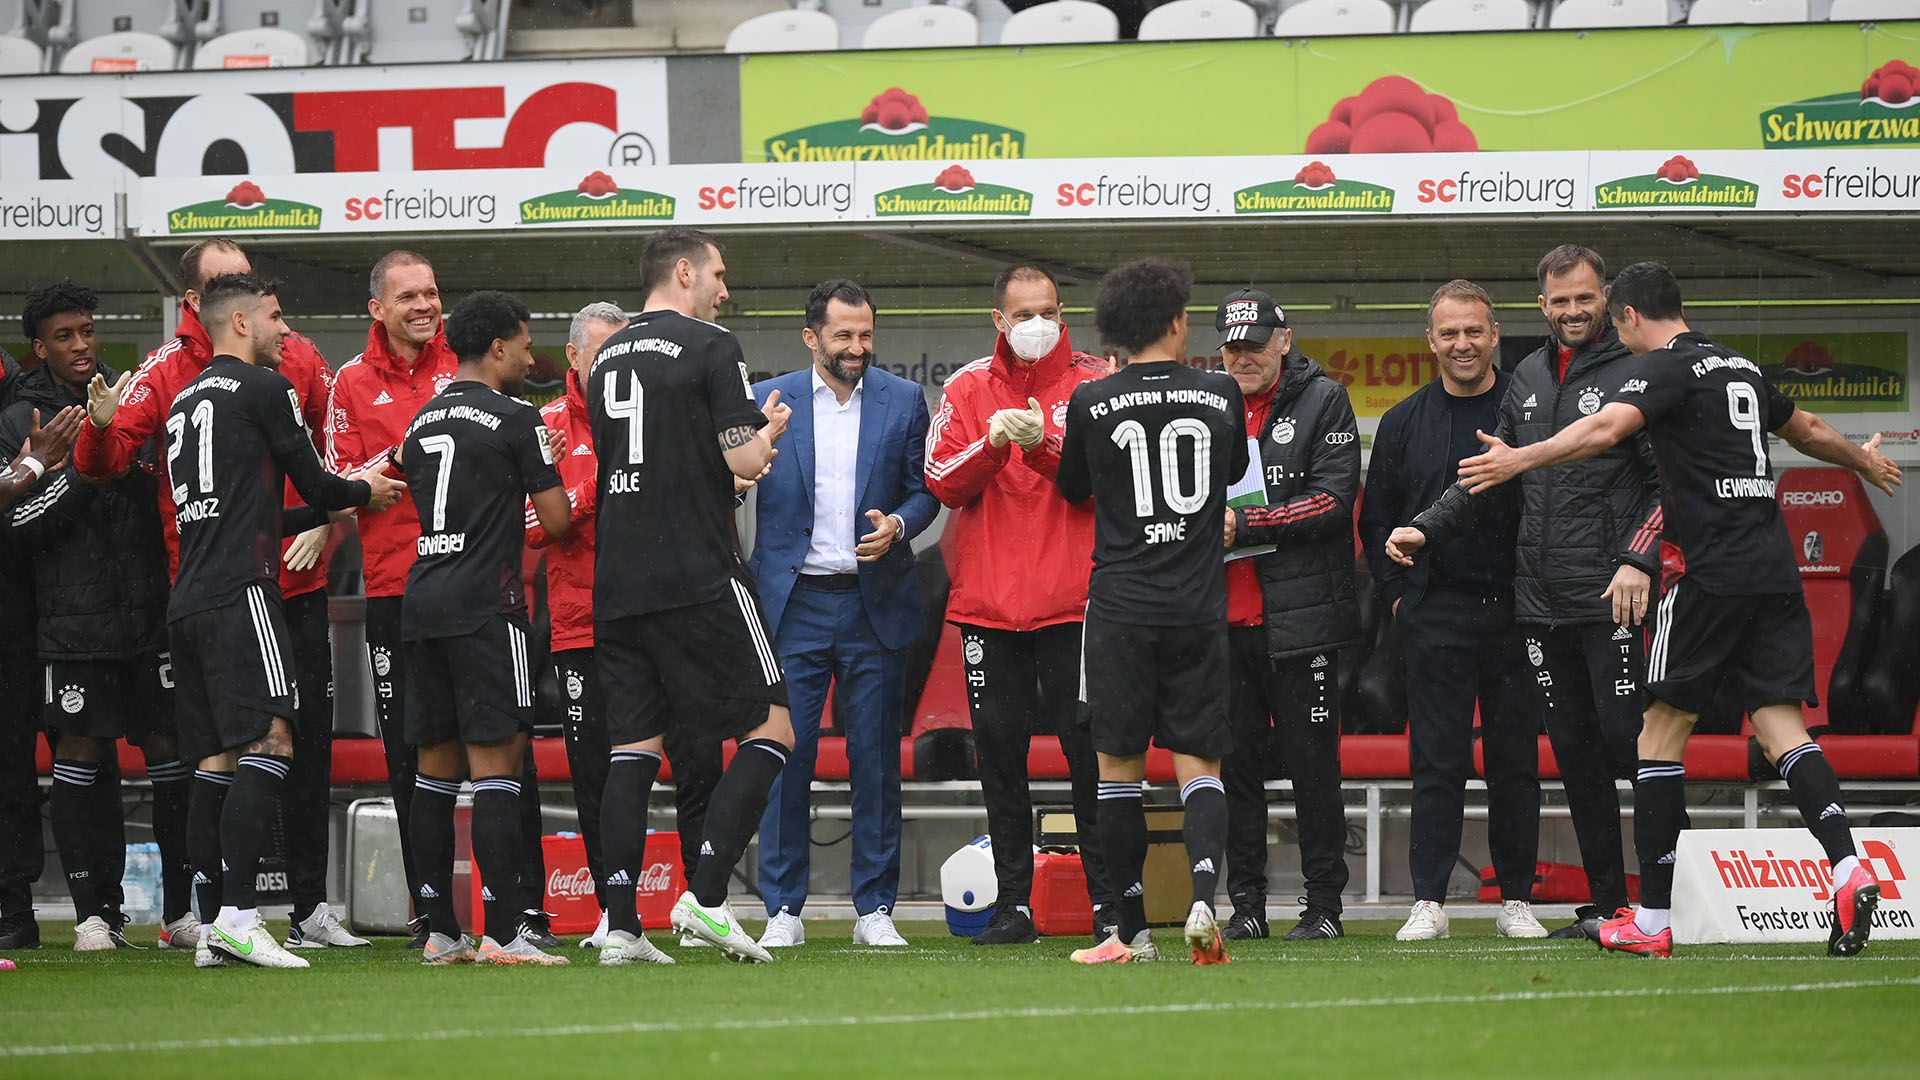 Lewandowski matches Muller record with 40th Bundesliga goal of the season for Bayern Munich | Goal.com